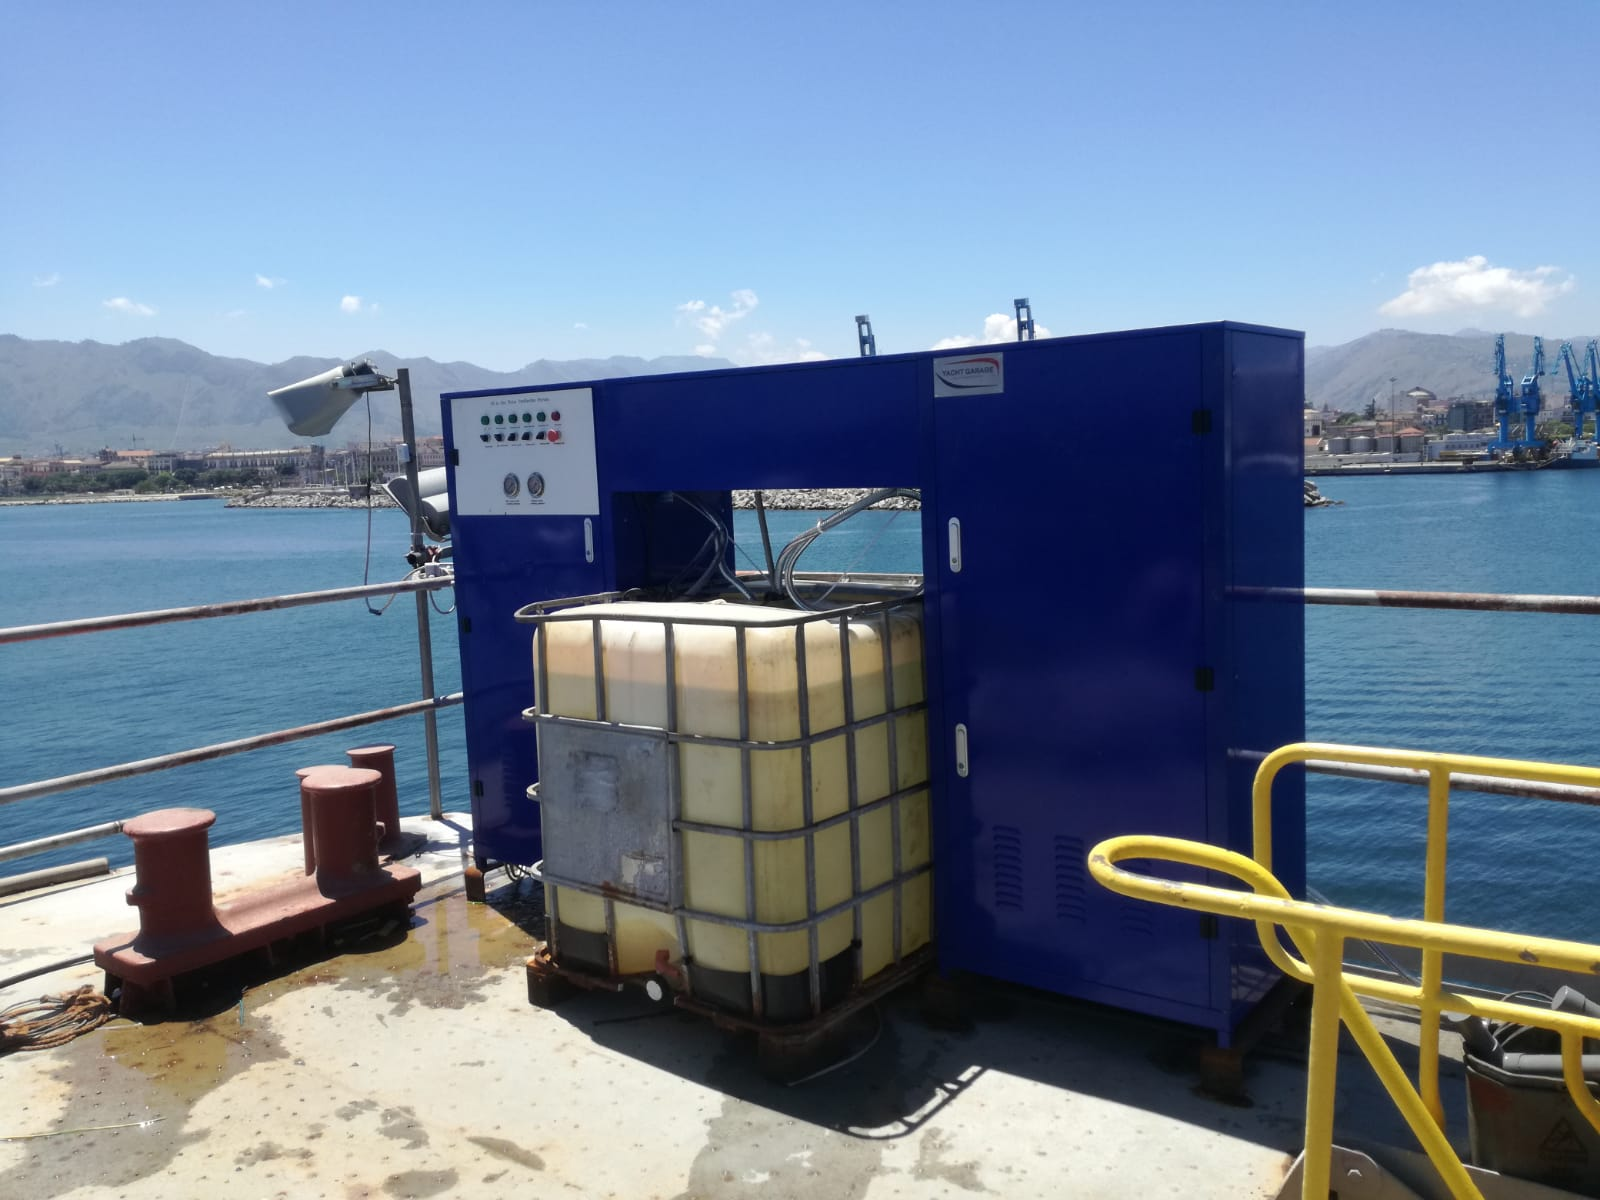 depuratore cantiere navale